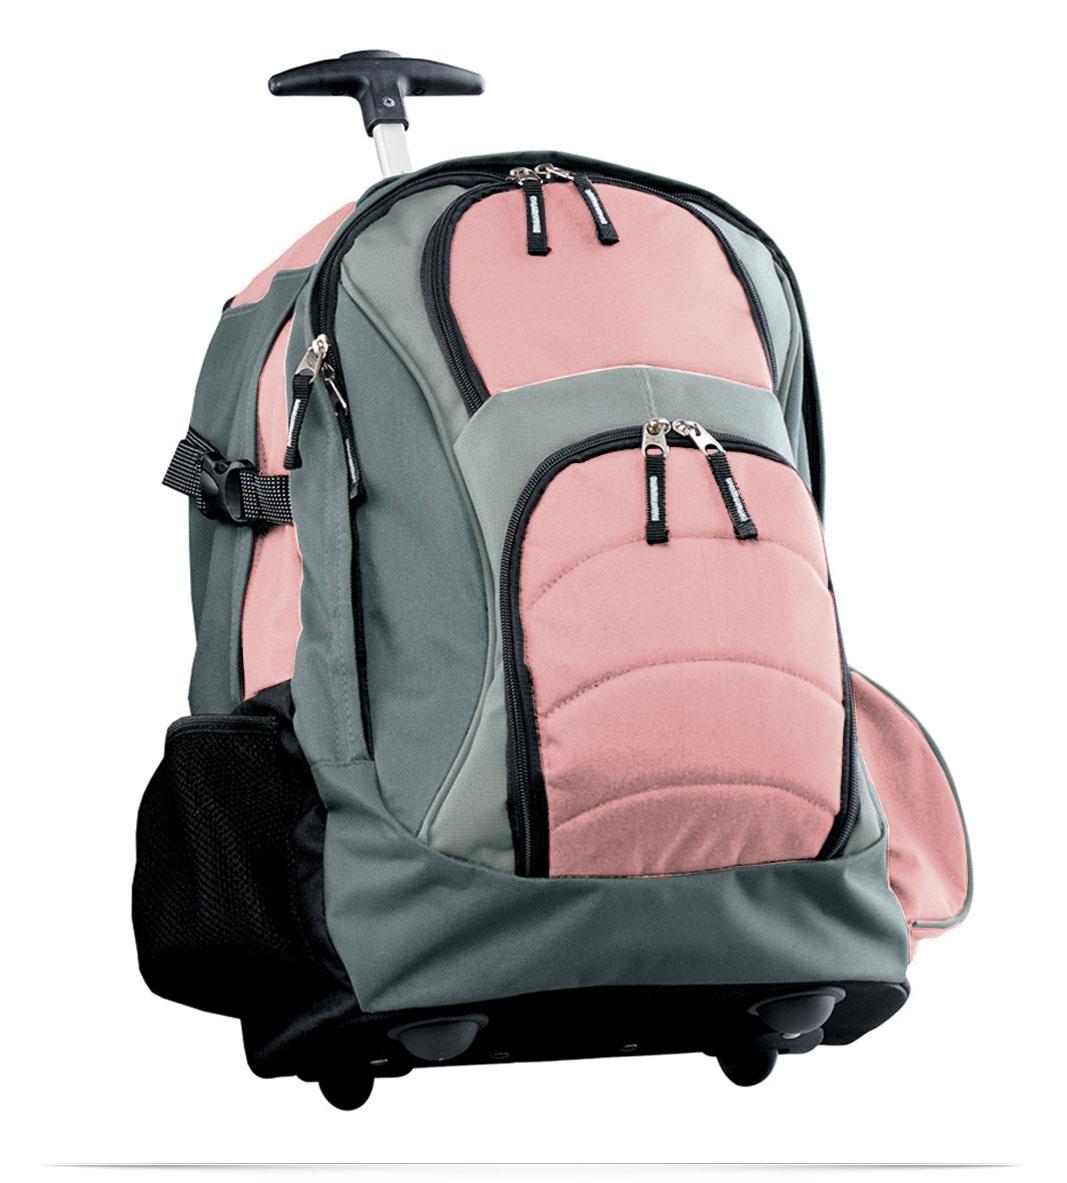 Personalized Wheeled Backpack